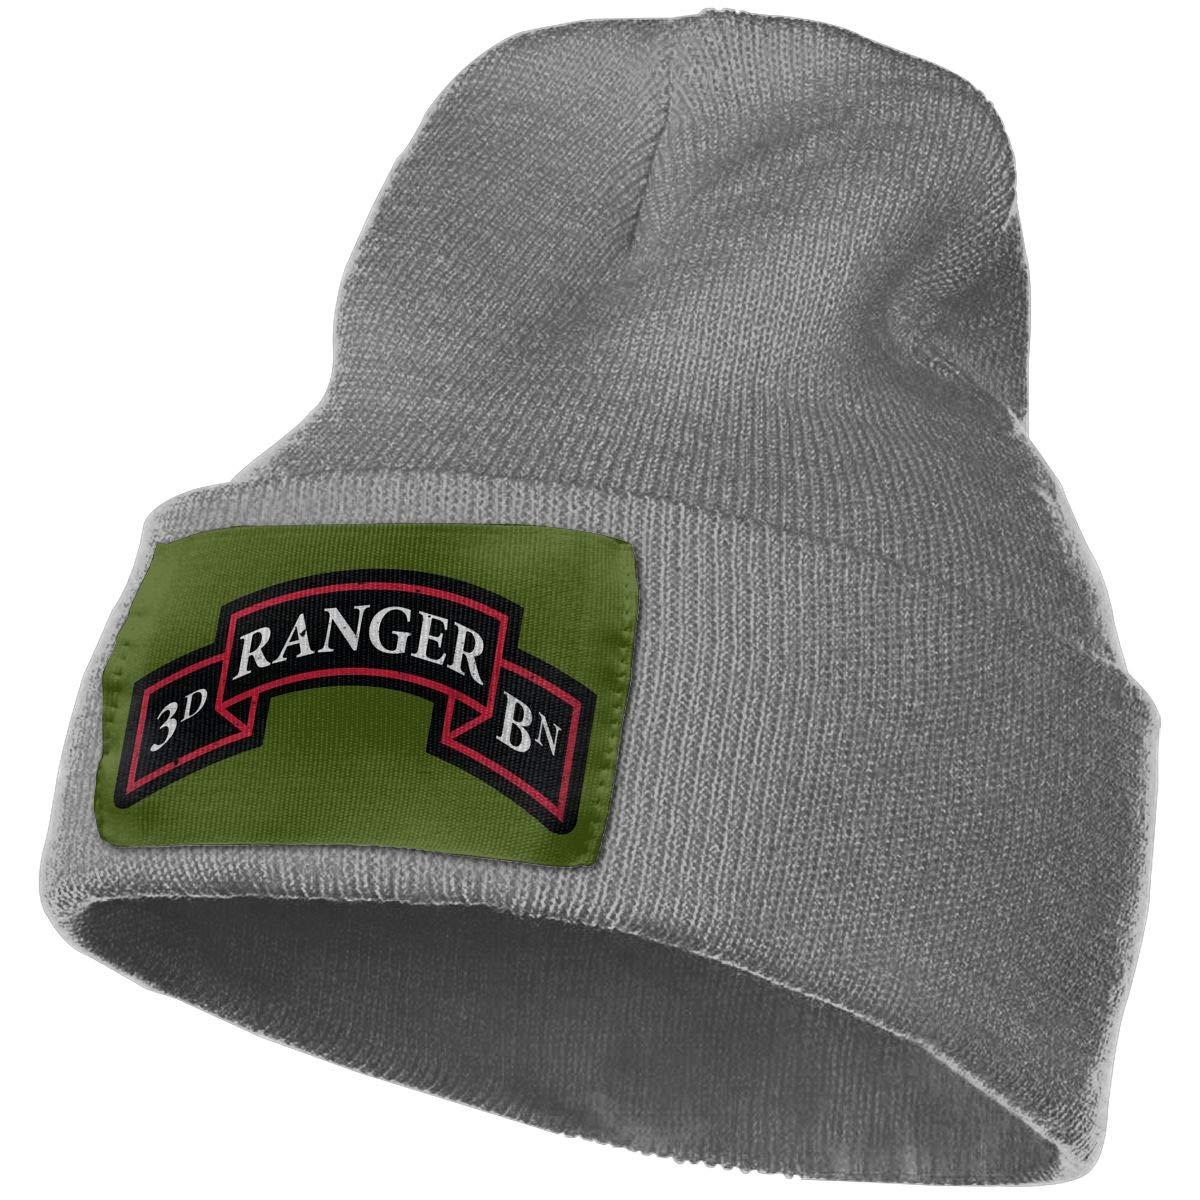 FORDSAN CP US Army Retro 3rd Ranger Battalion Mens Beanie Cap Skull Cap Winter Warm Knitting Hats.